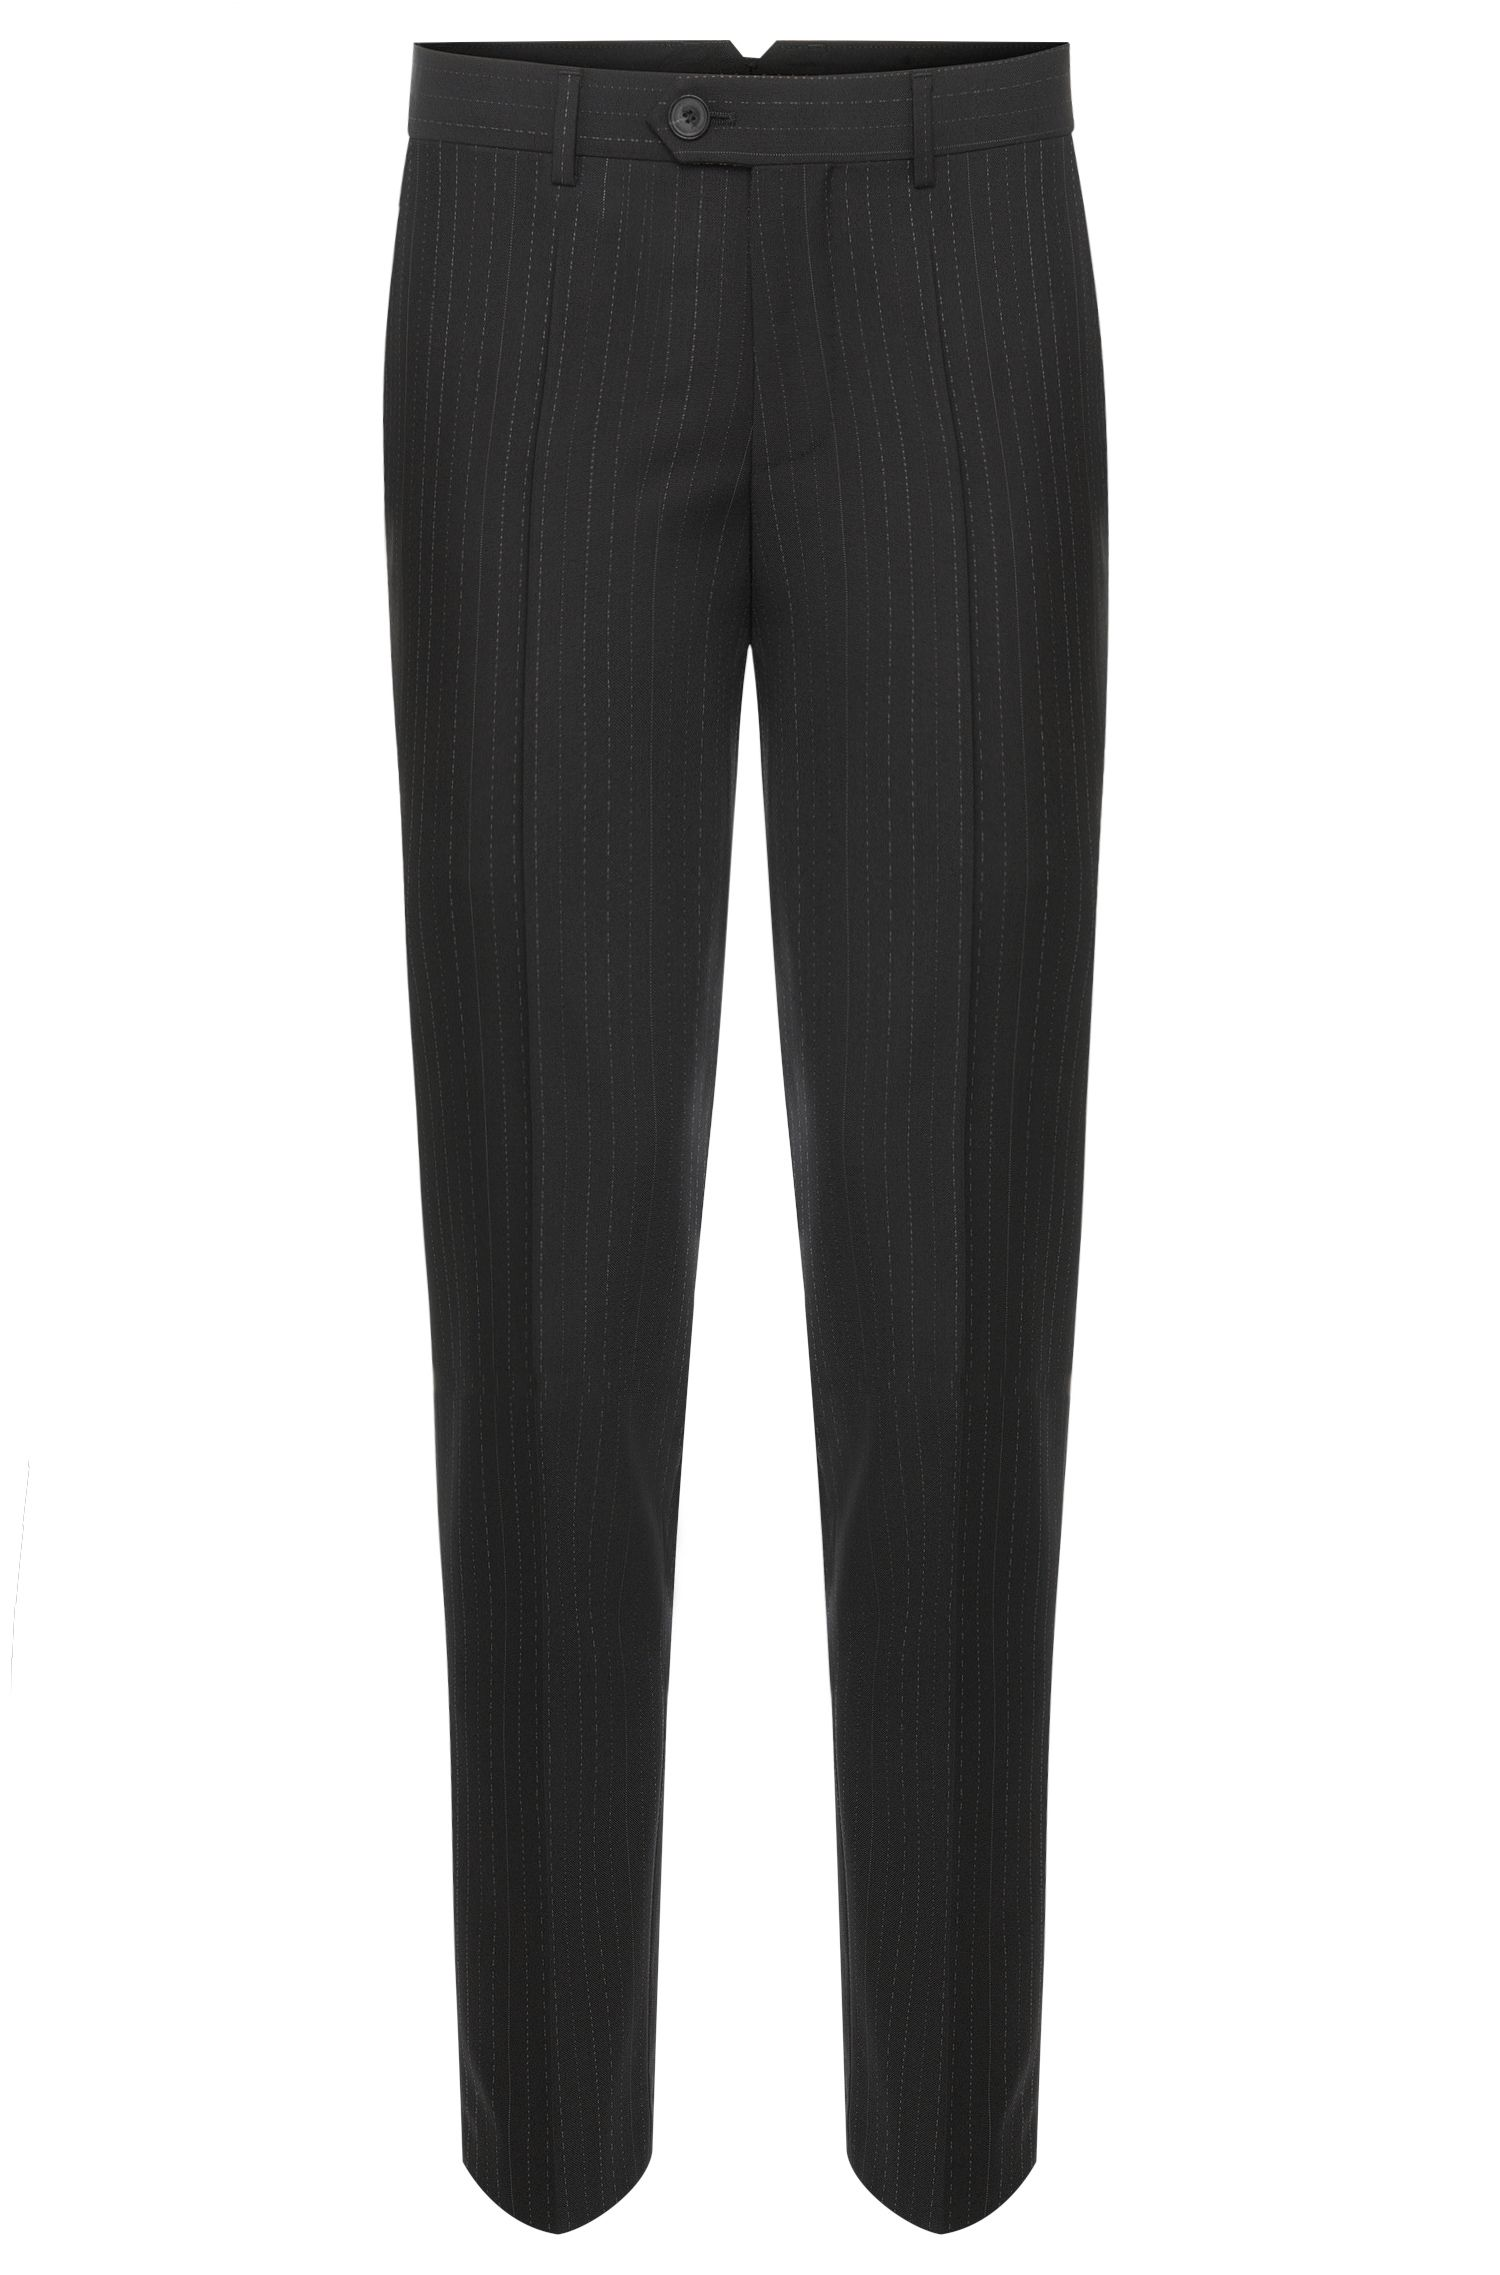 'Hening' | Tapered Fit, Virgin Wool Pinstriped Dress Pants